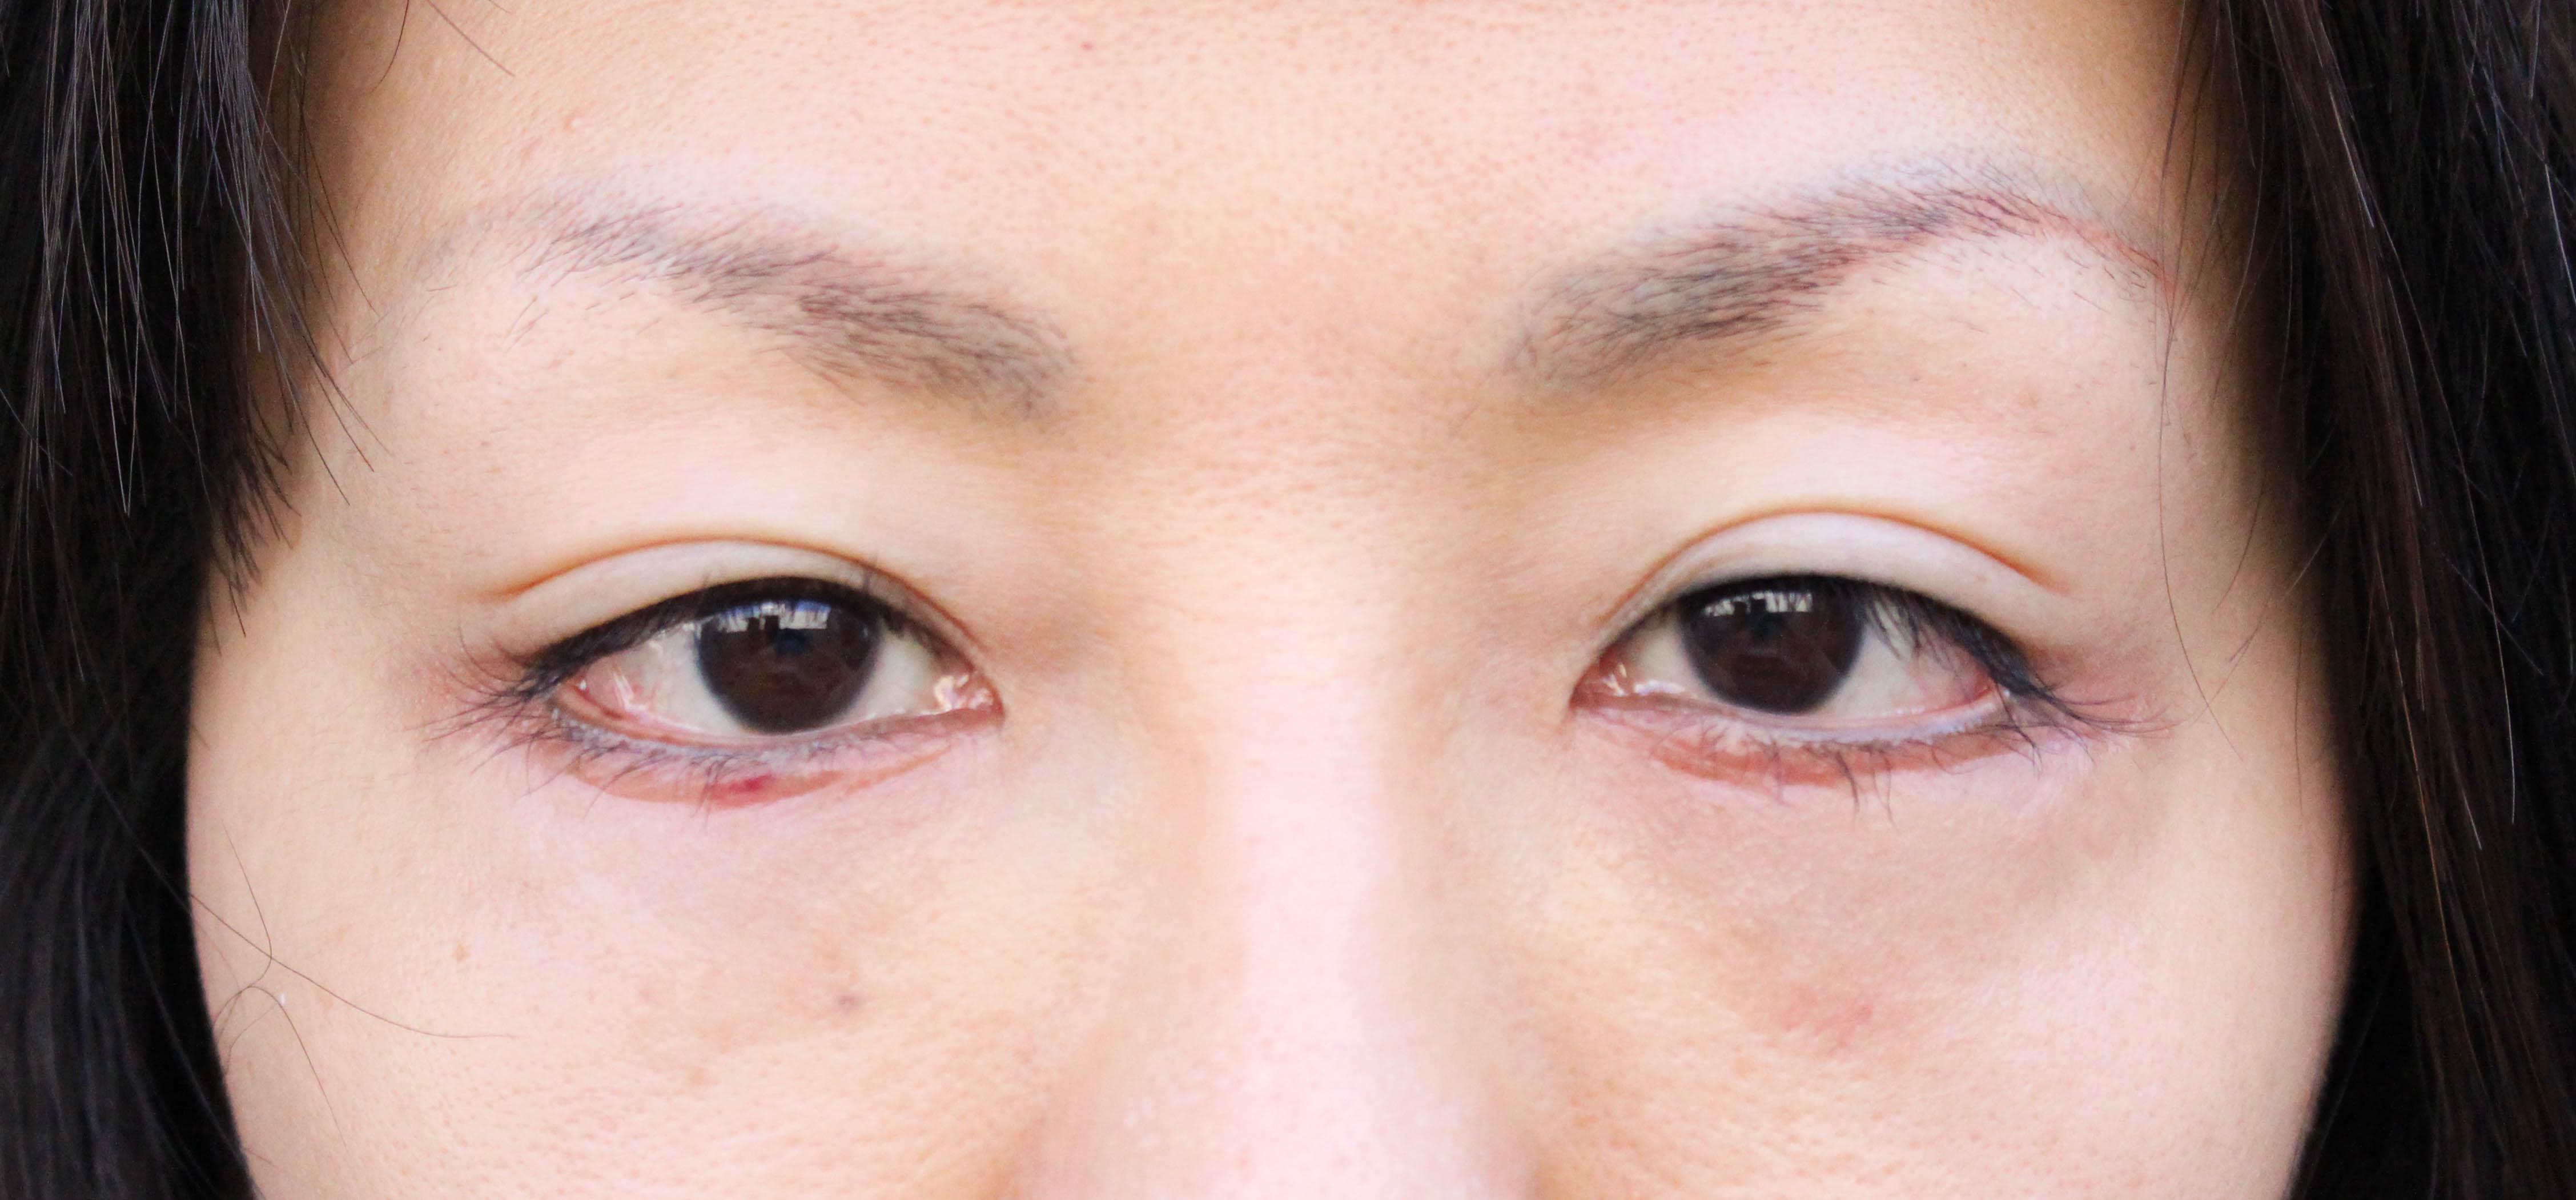 hamura28-3 - image